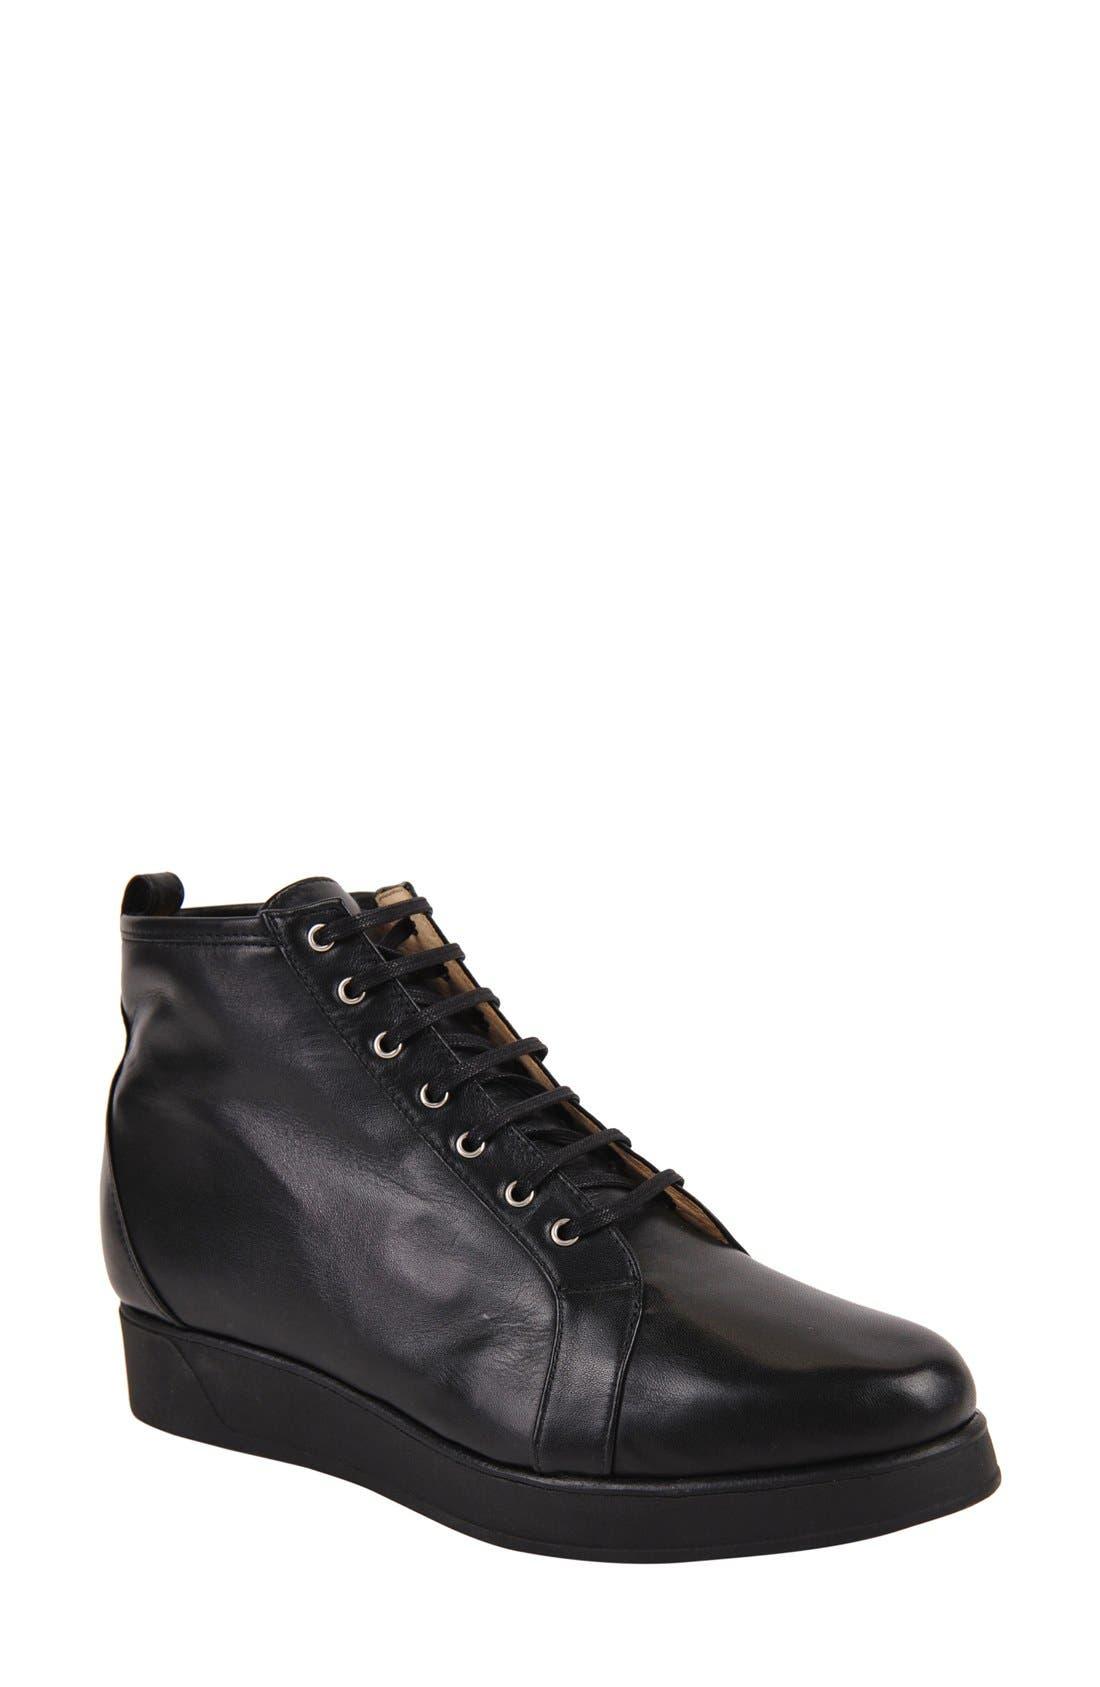 Alberta Bootie,                             Main thumbnail 1, color,                             Black Leather